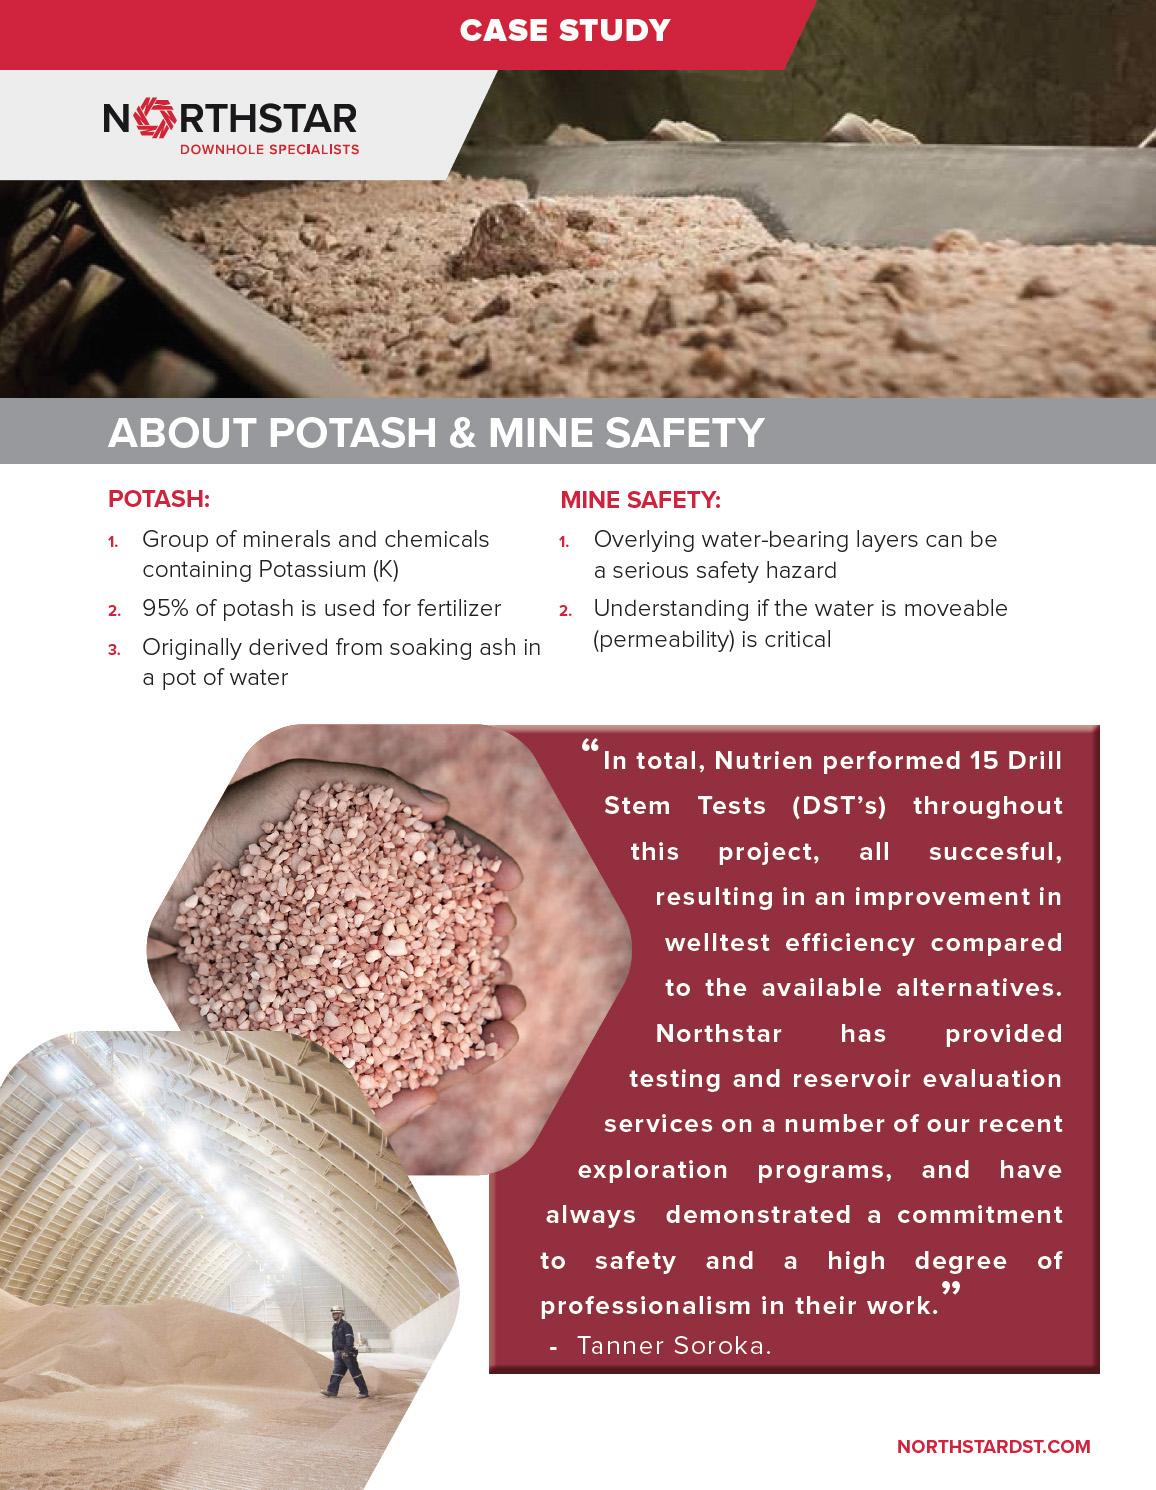 Northstar DST - Downhole Testing Specialists Nutrien